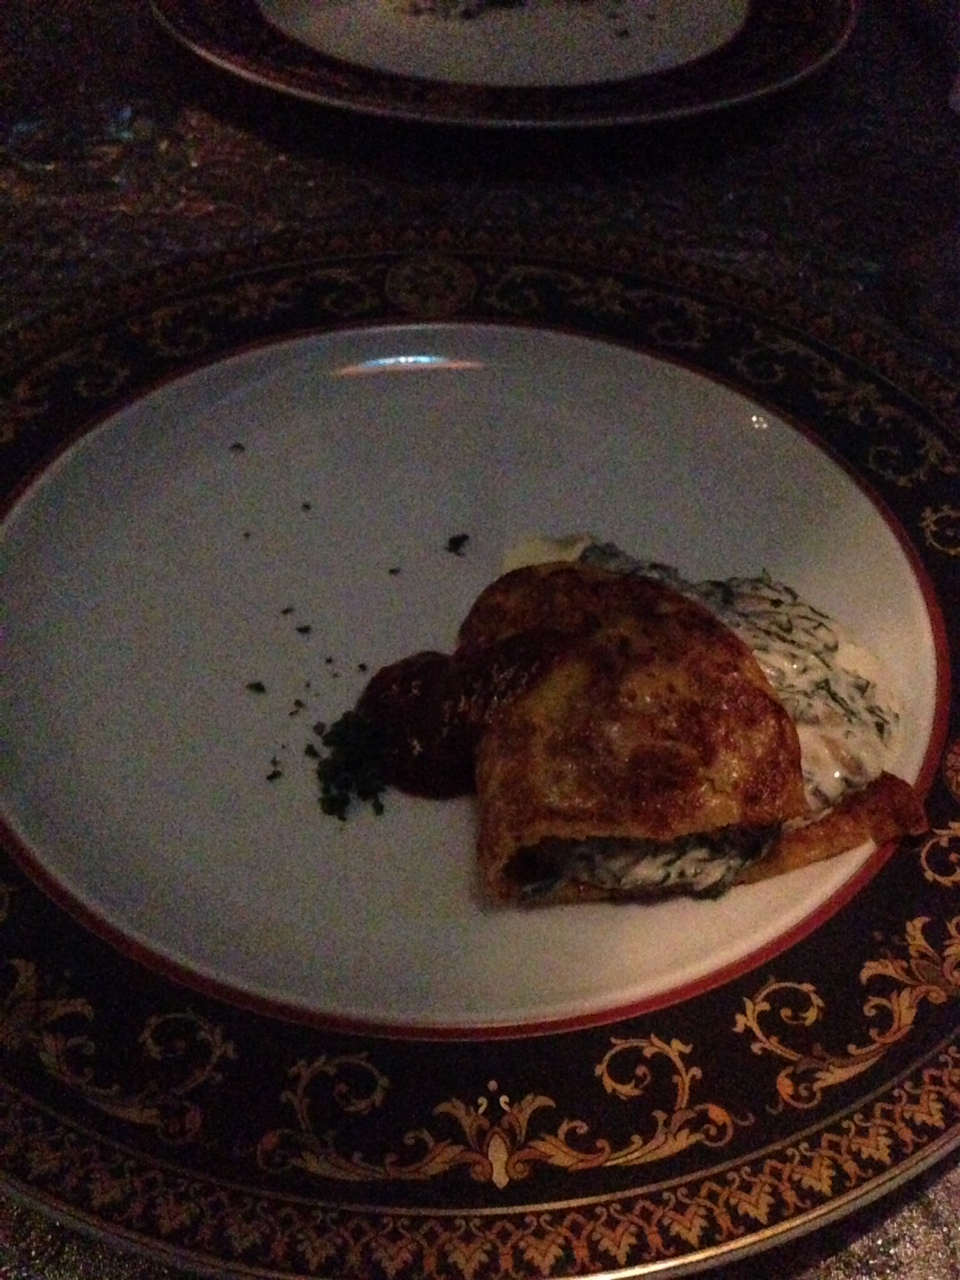 Entrees ~ Chef's Special Salad, Dijaj m'qualli, Spanakos Menemen